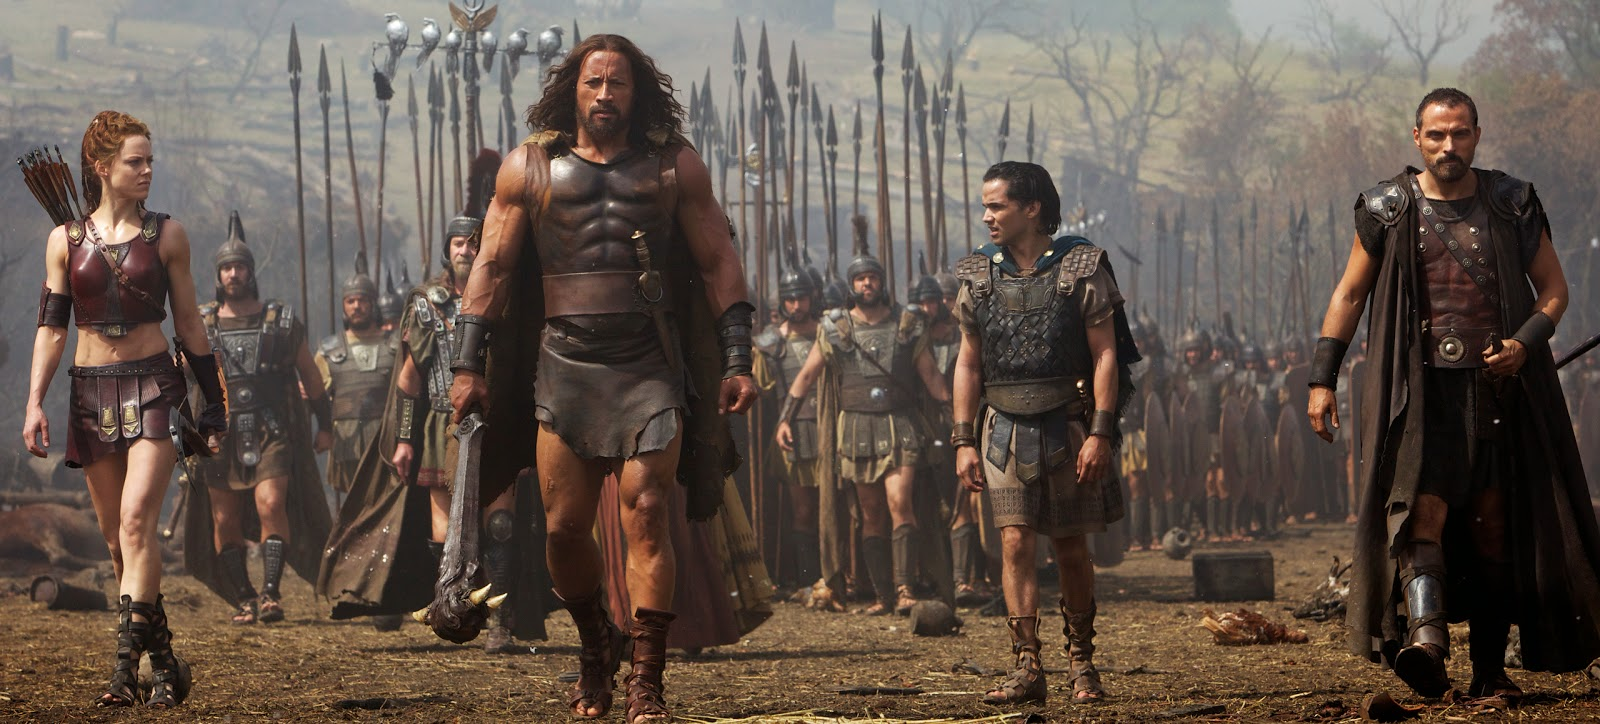 batalla, hércules, fotograma, película, guerreros